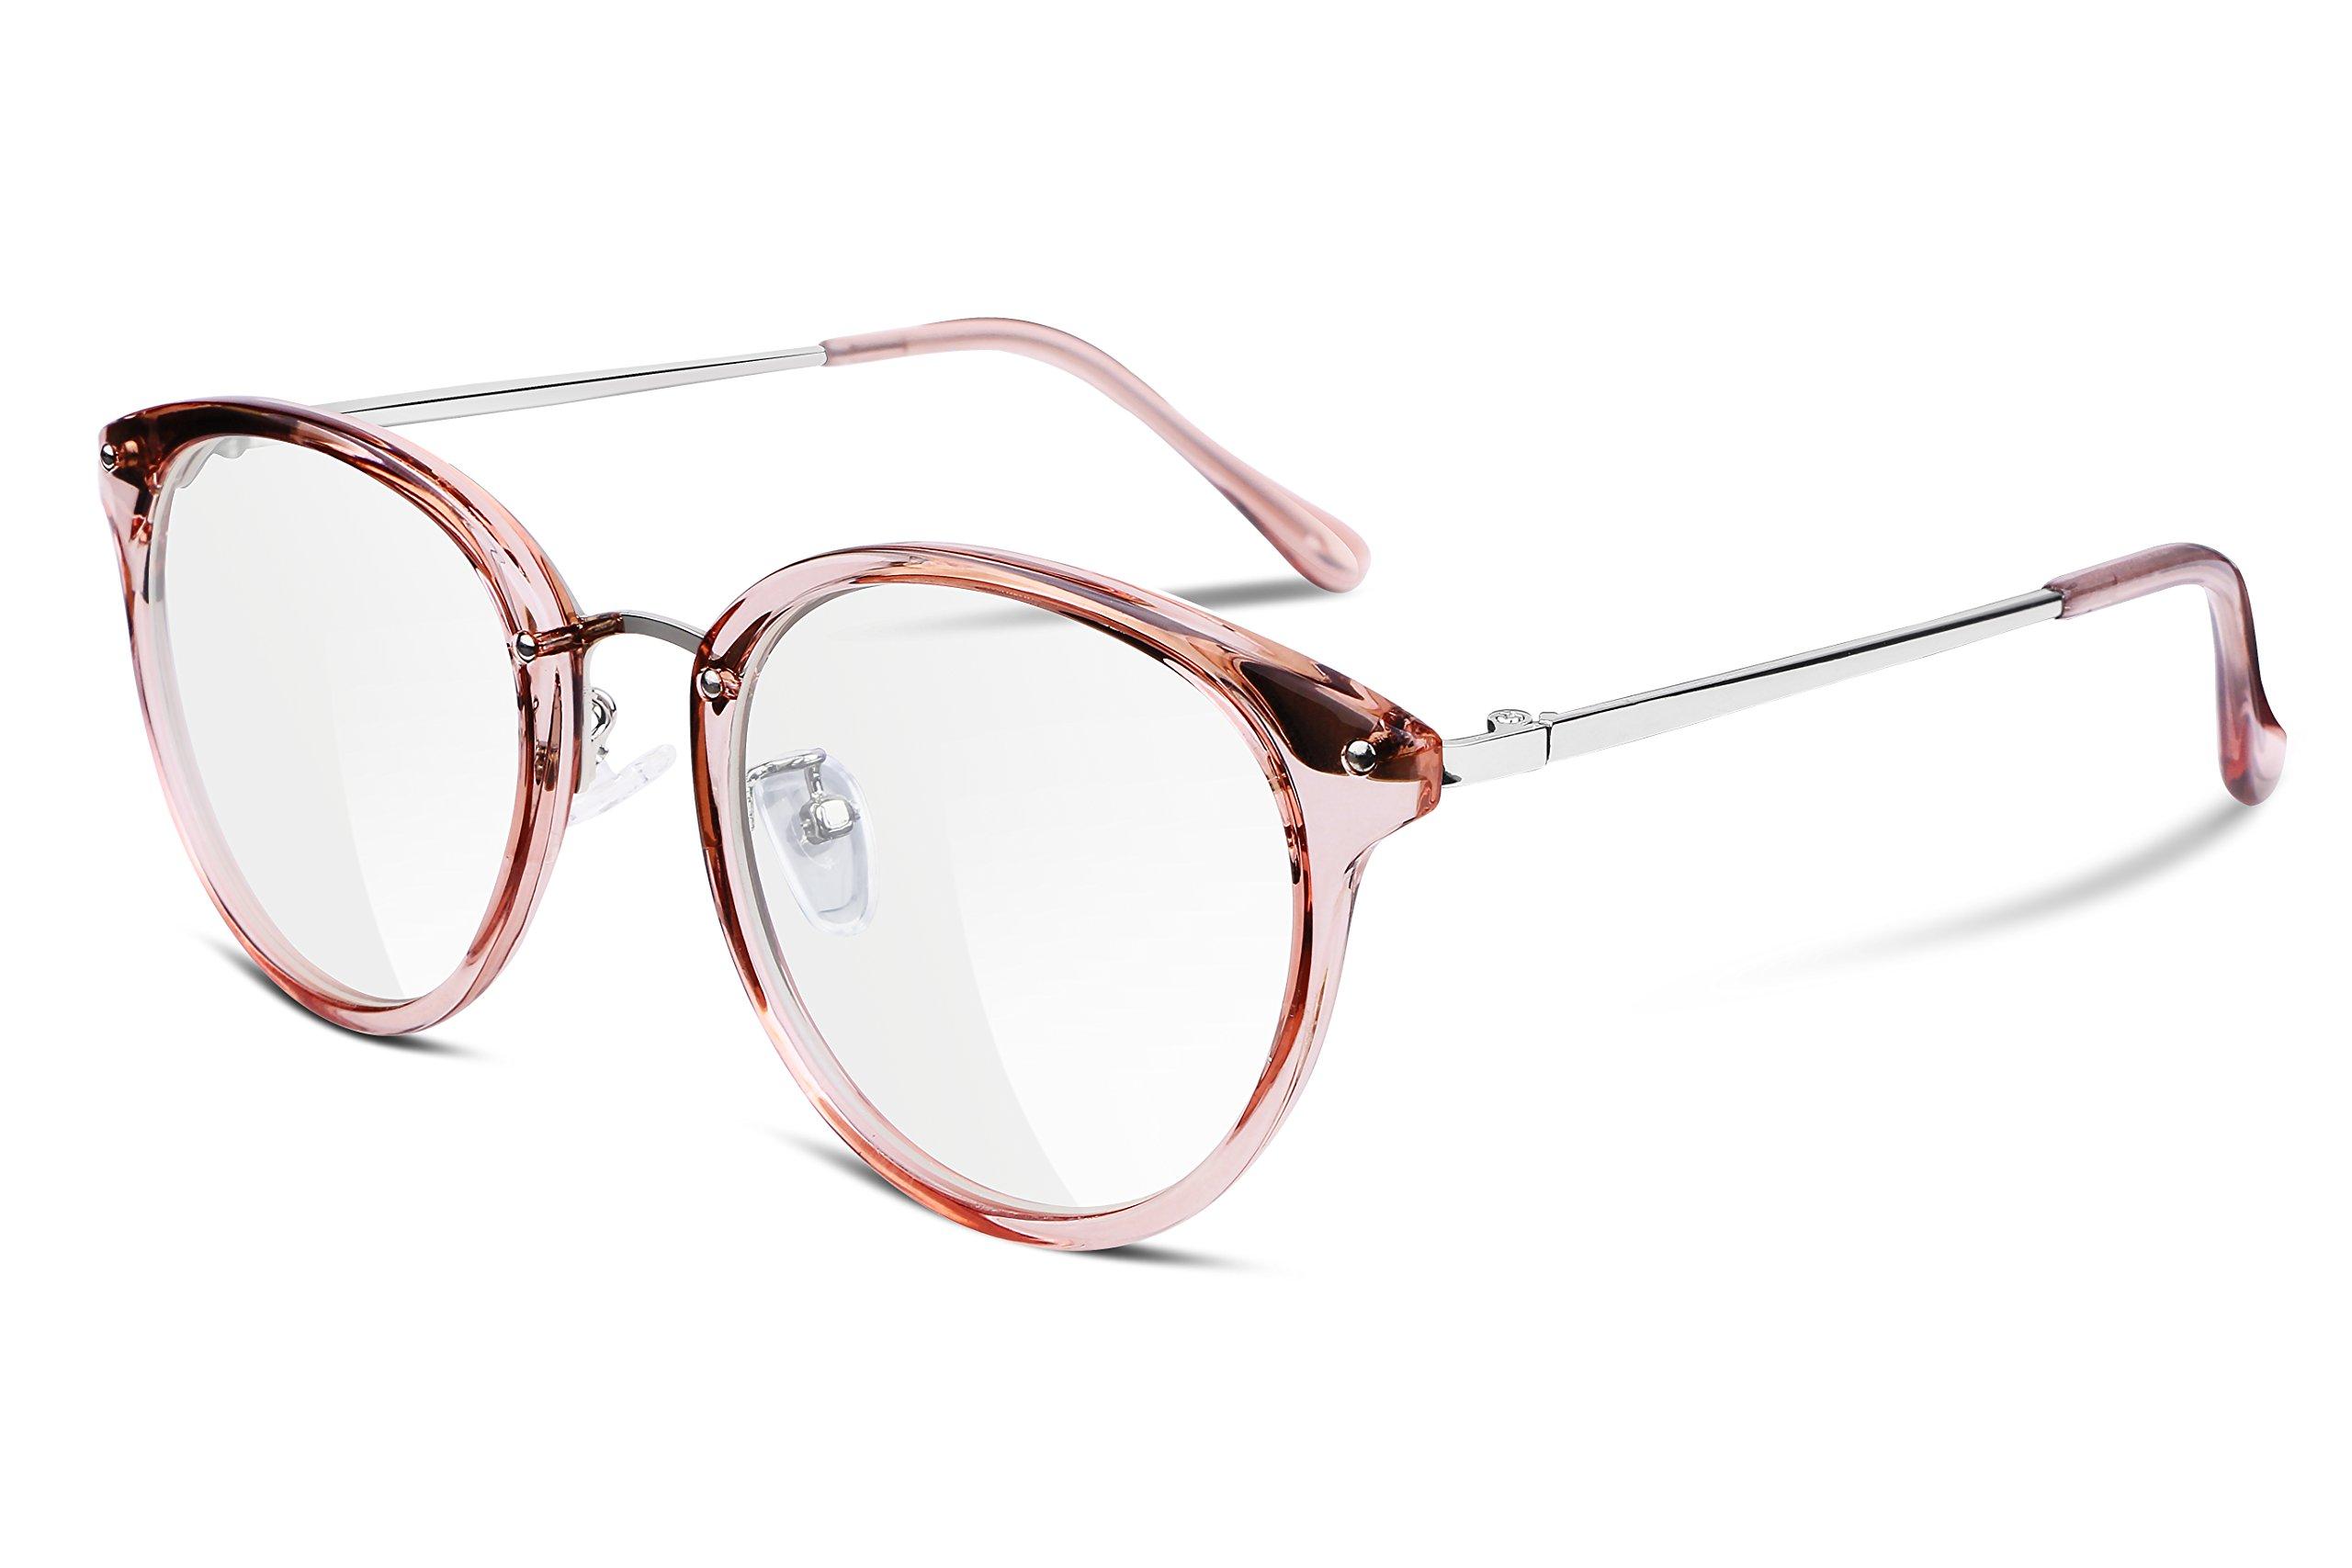 FEISEDY Vintage Round Eyewear Non Prescription Glasses Frames Women Men B2260